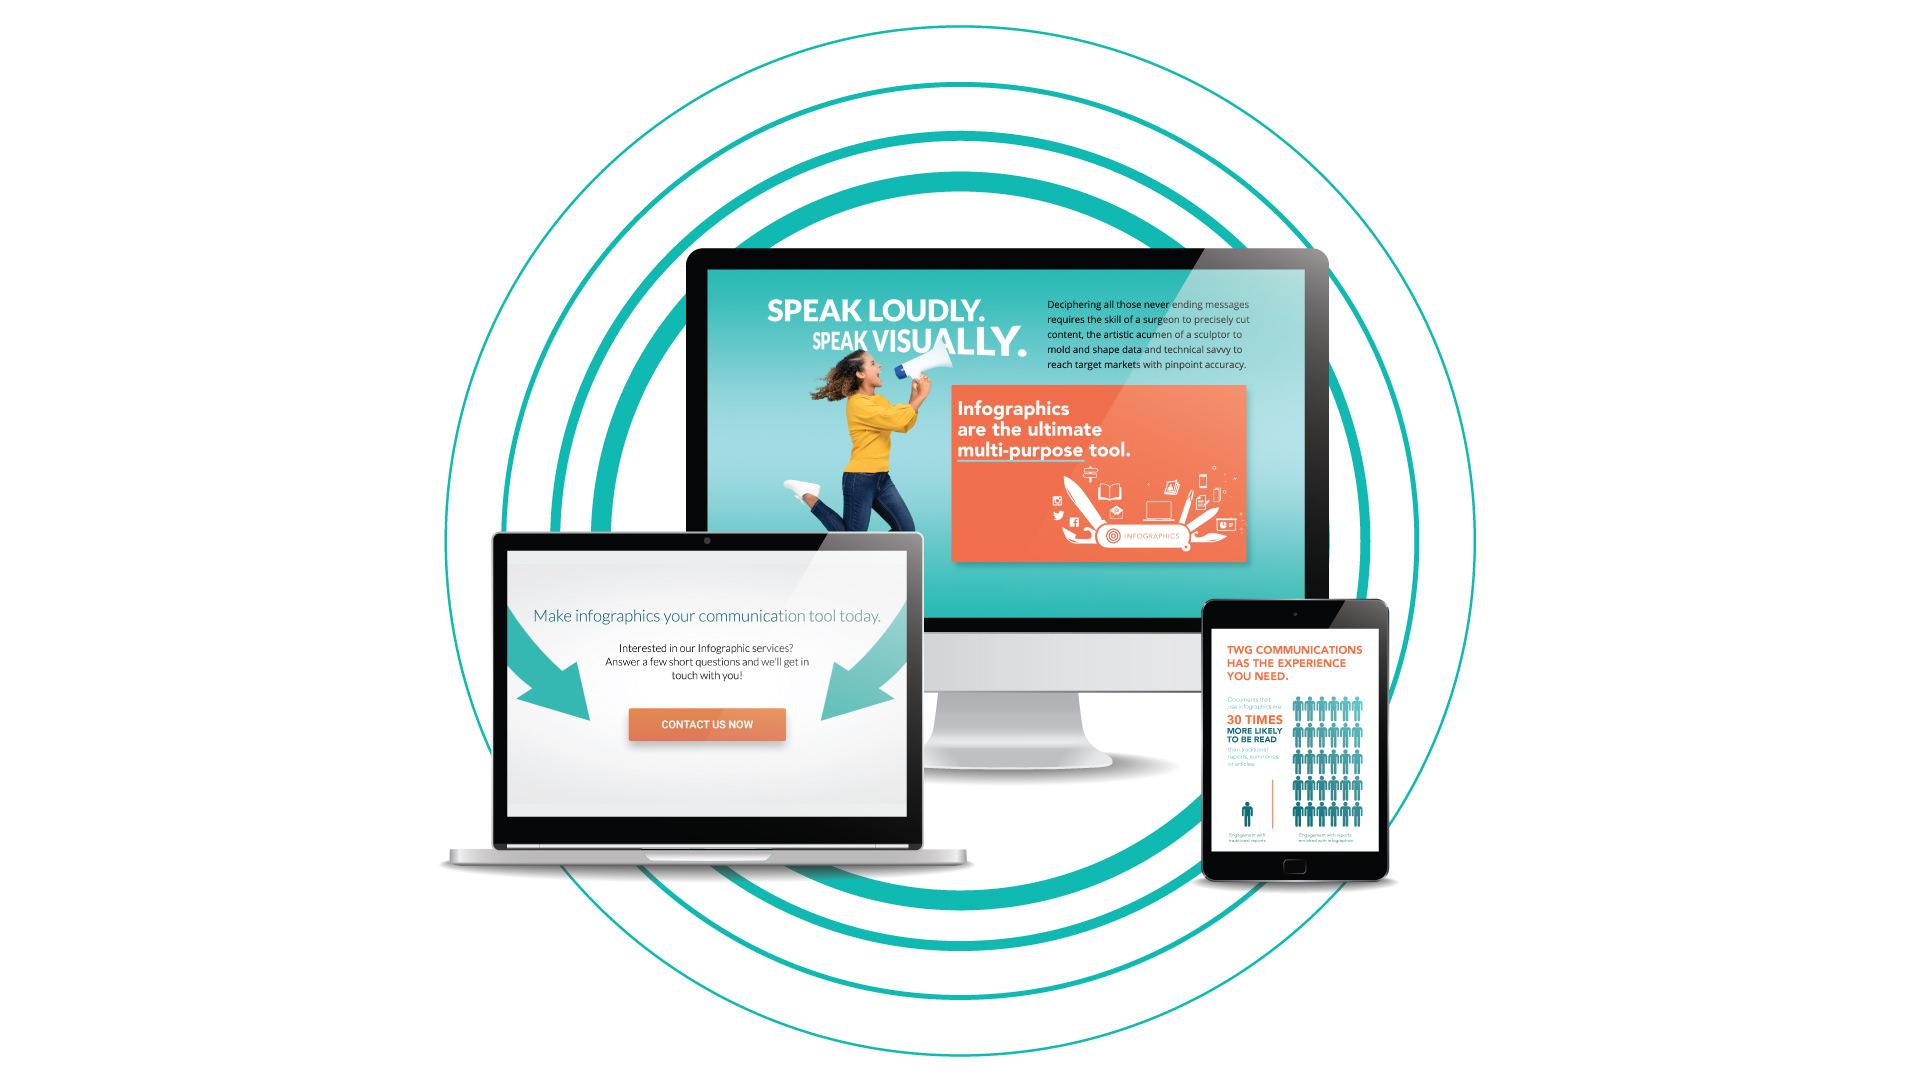 Blog-Tips-For-Your-Next-Landing-Page-blog-header2